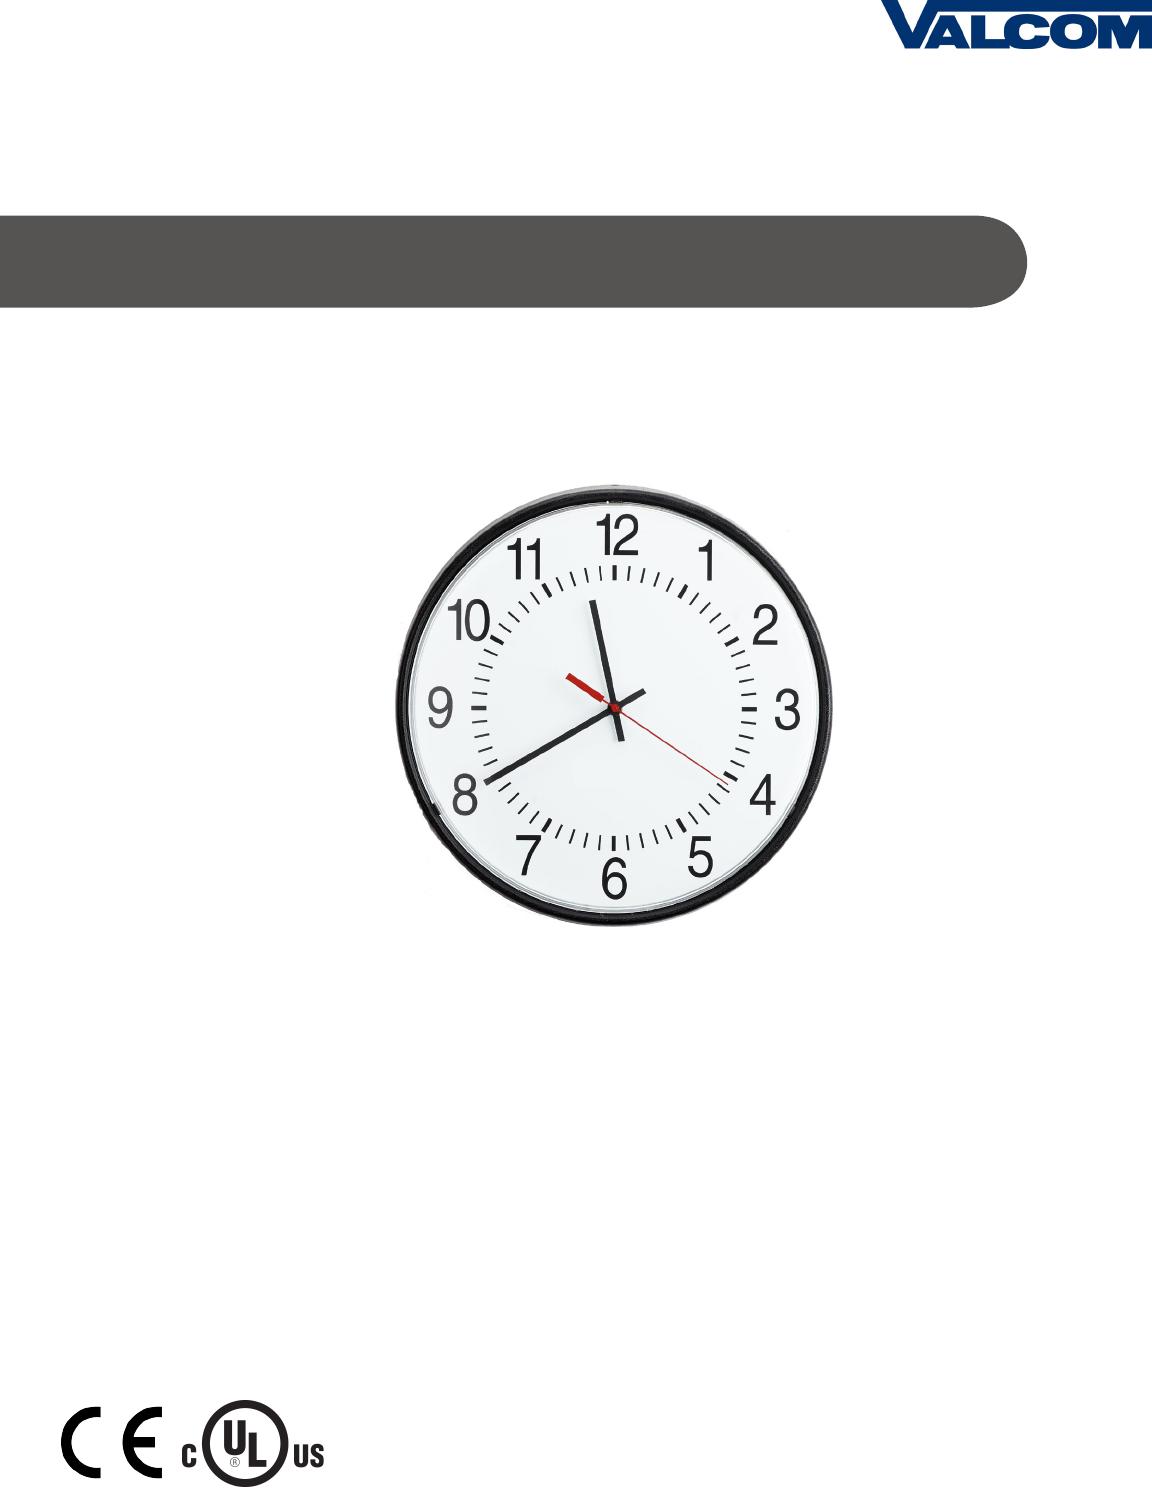 Valcom V A2412/16 Wired og Clock Installation Manual ... on